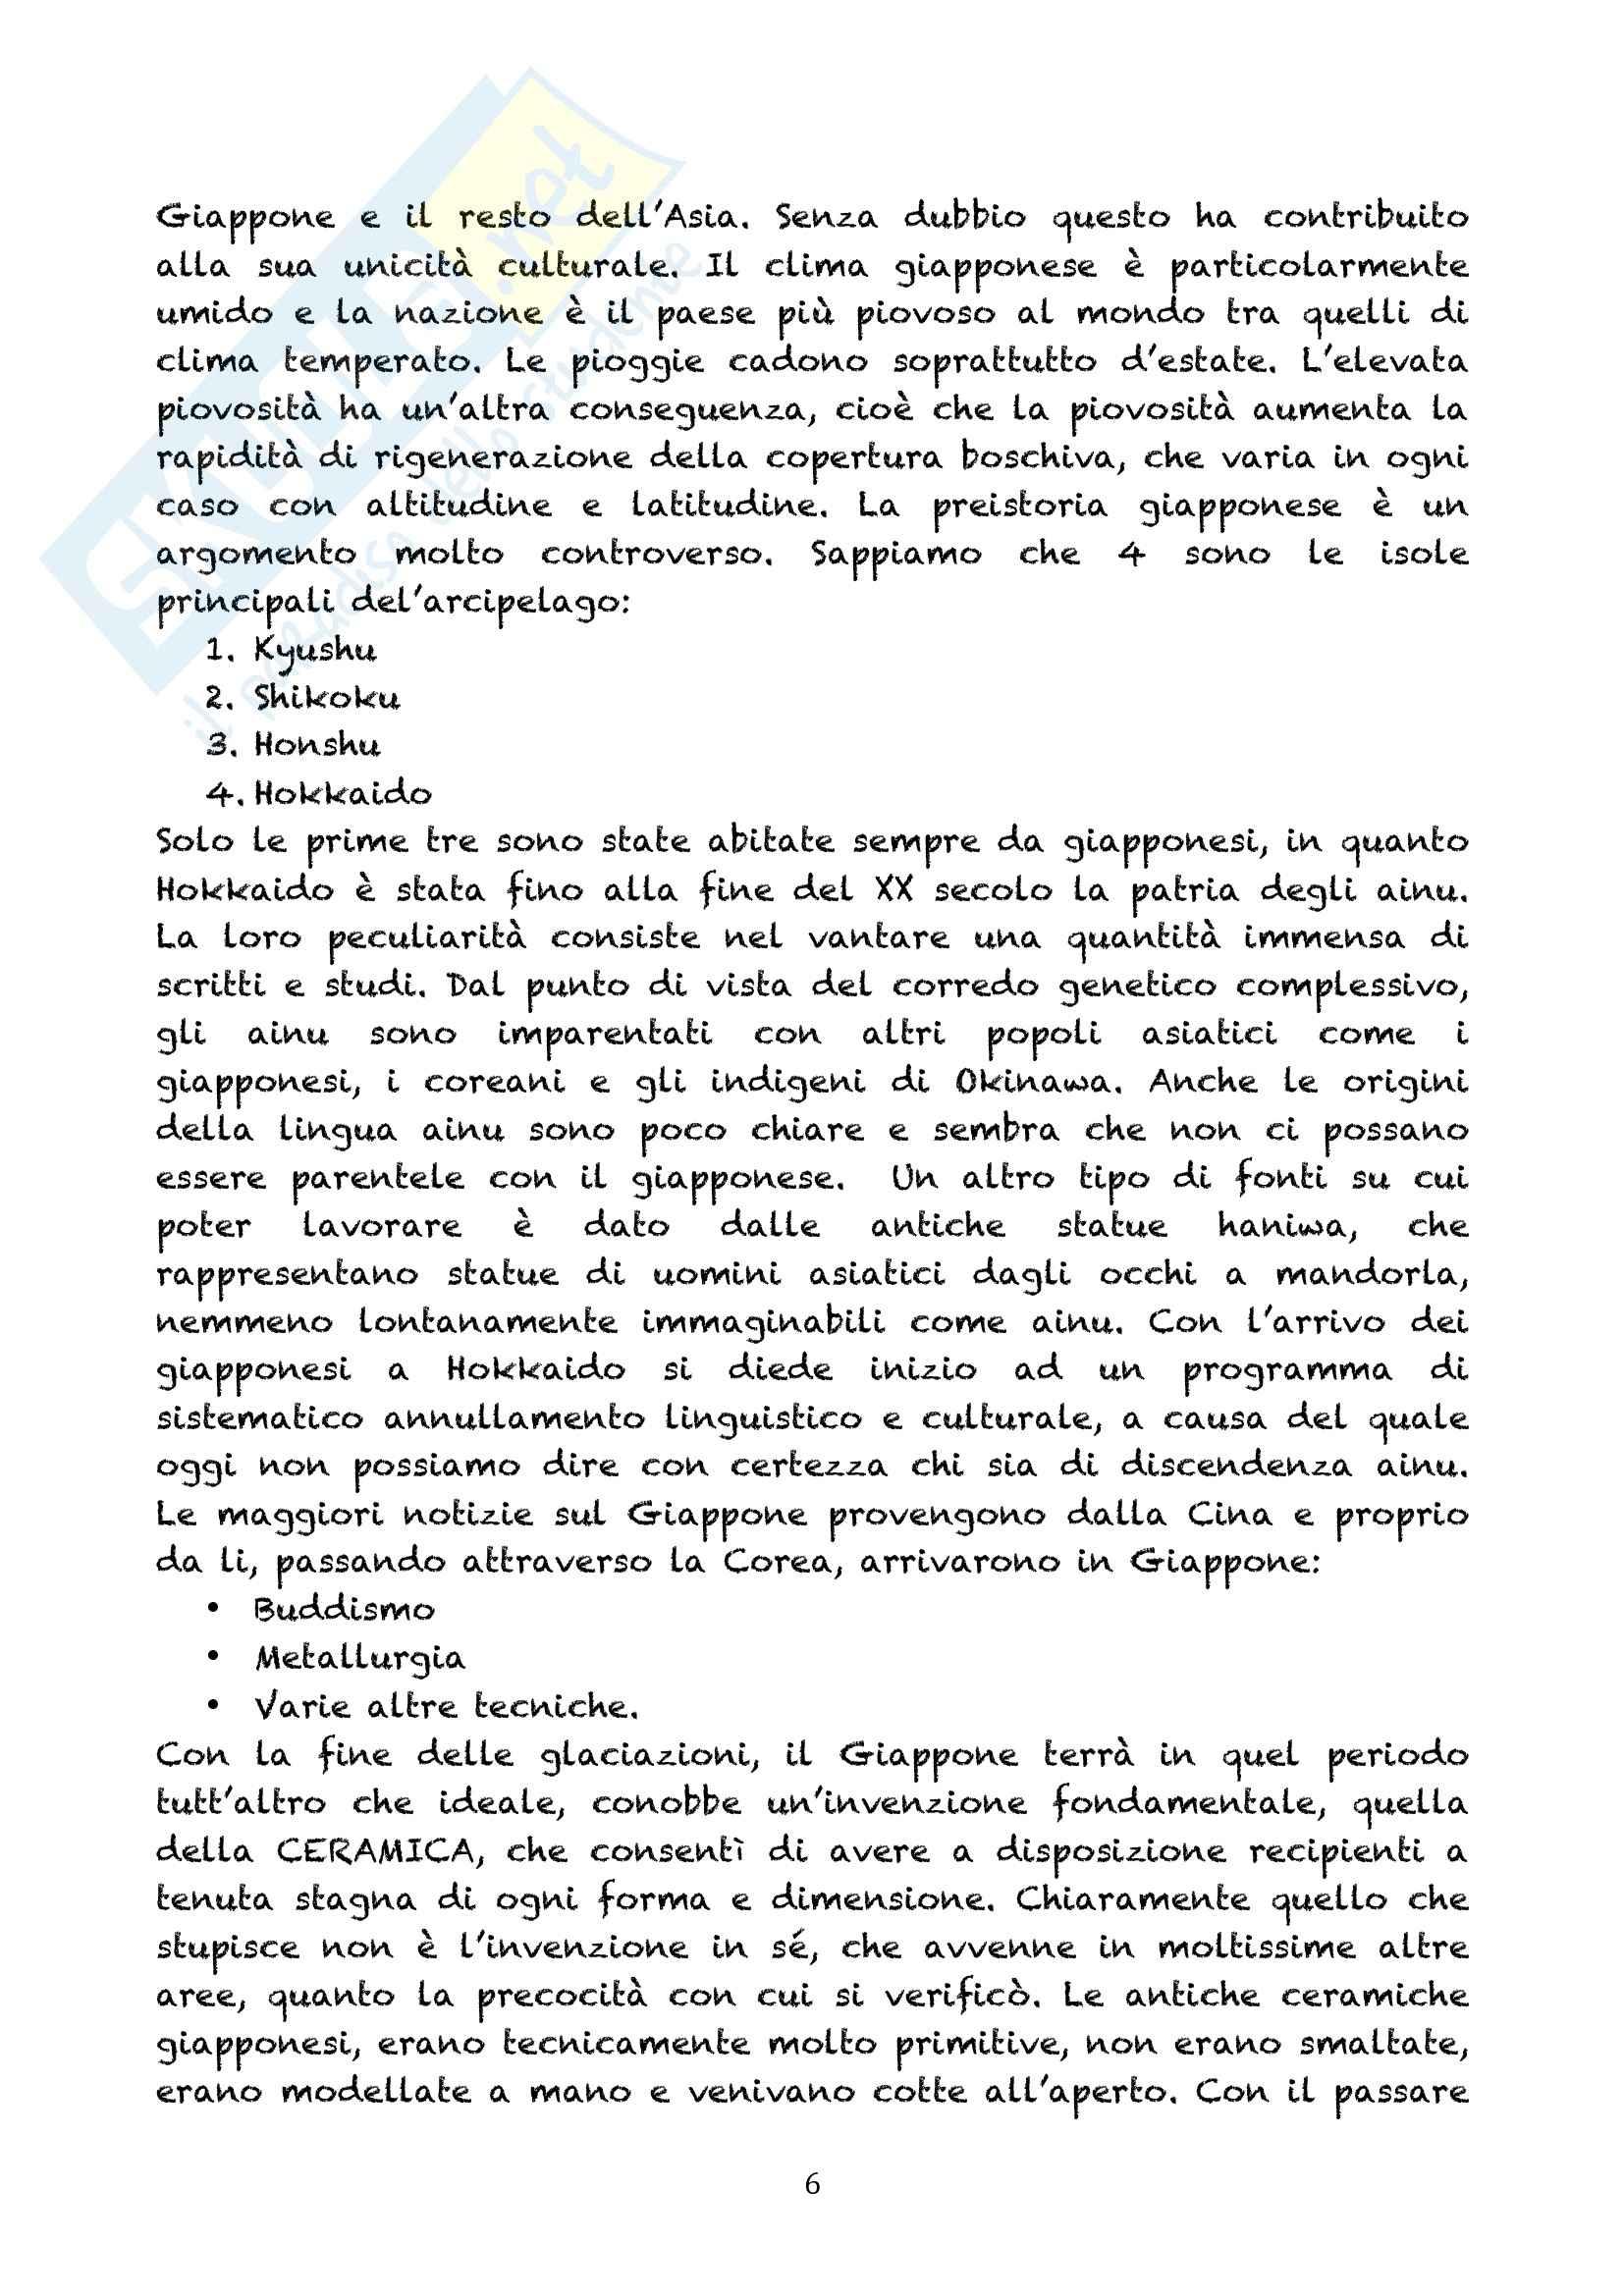 Riassunto esame Linguistica generale, prof. Longobardi, libro consigliato Armi, acciaio e malattie, Diamond (Epilogo) Pag. 6